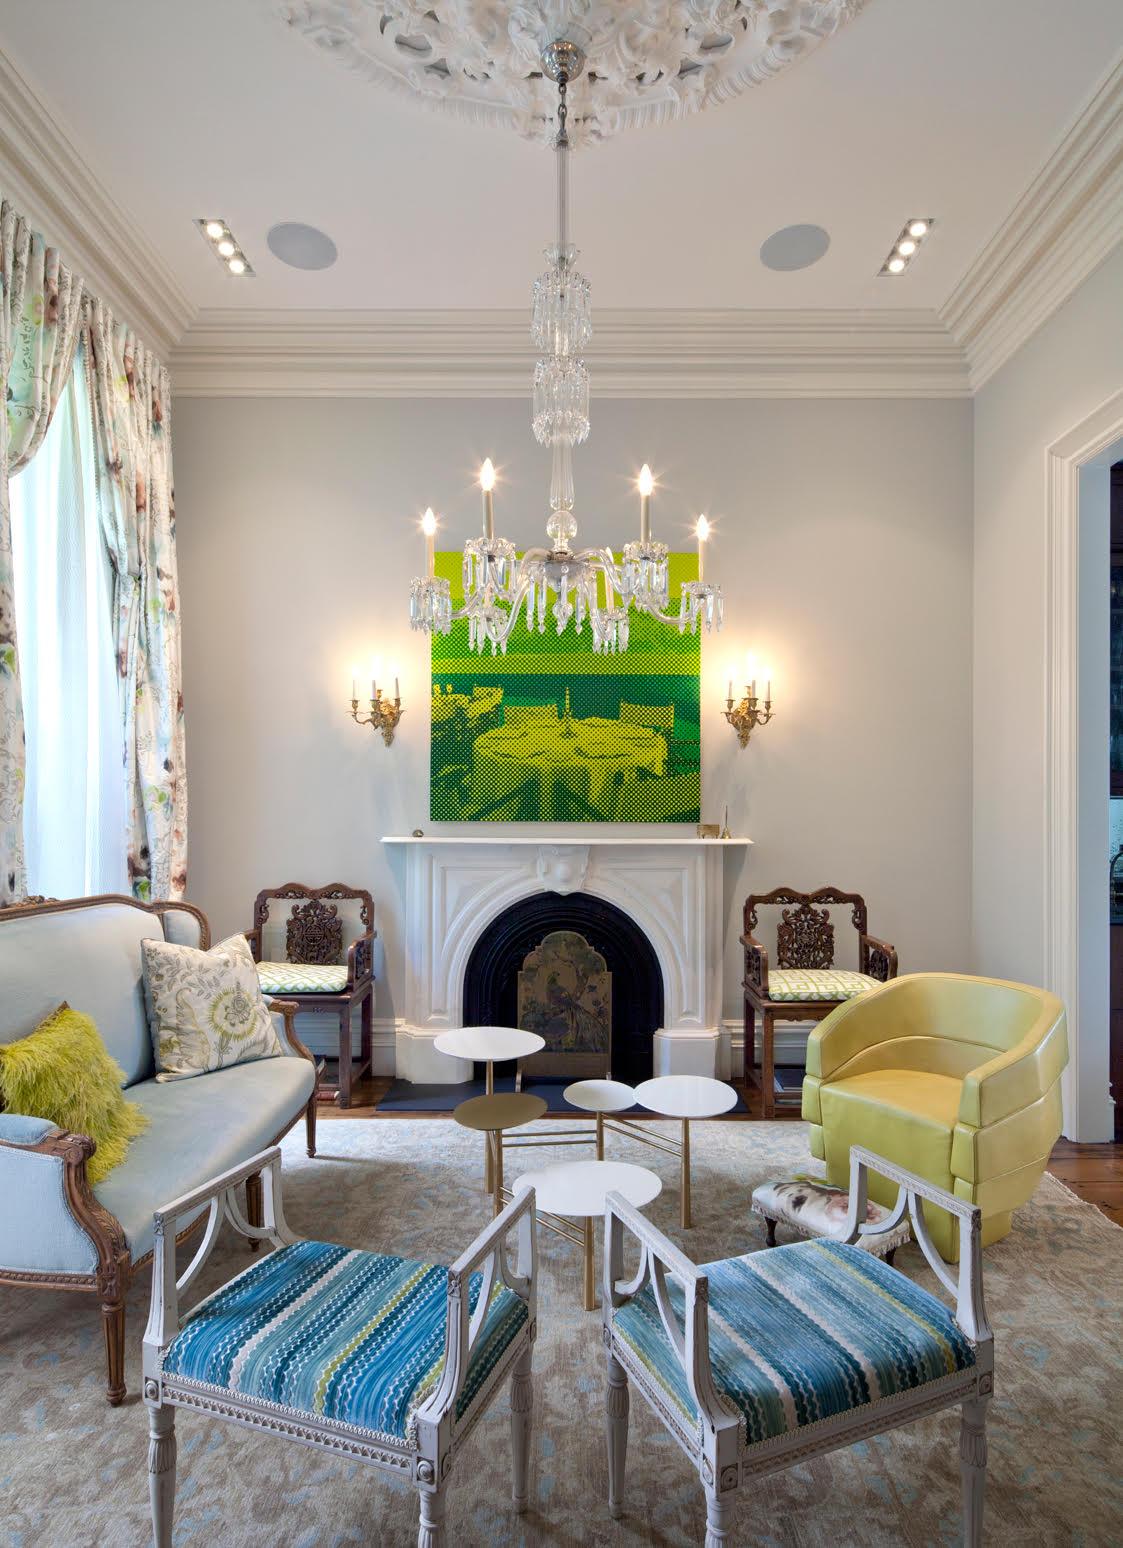 Brooklyn living room by Tamara Eaton